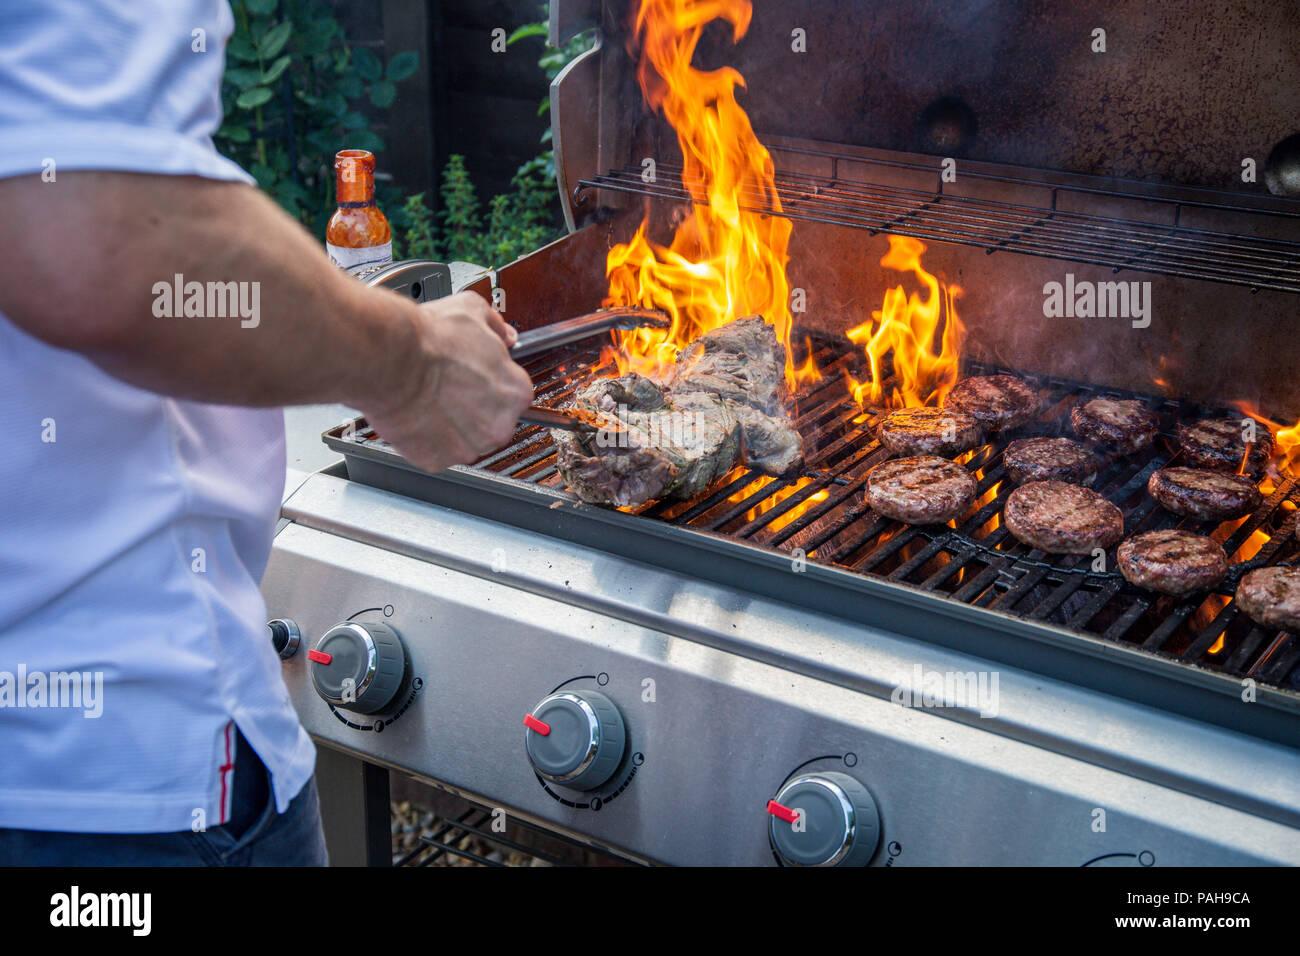 Gas Oder Holzkohlegrill Yorkshire : Kochen burger stockfotos & kochen burger bilder alamy